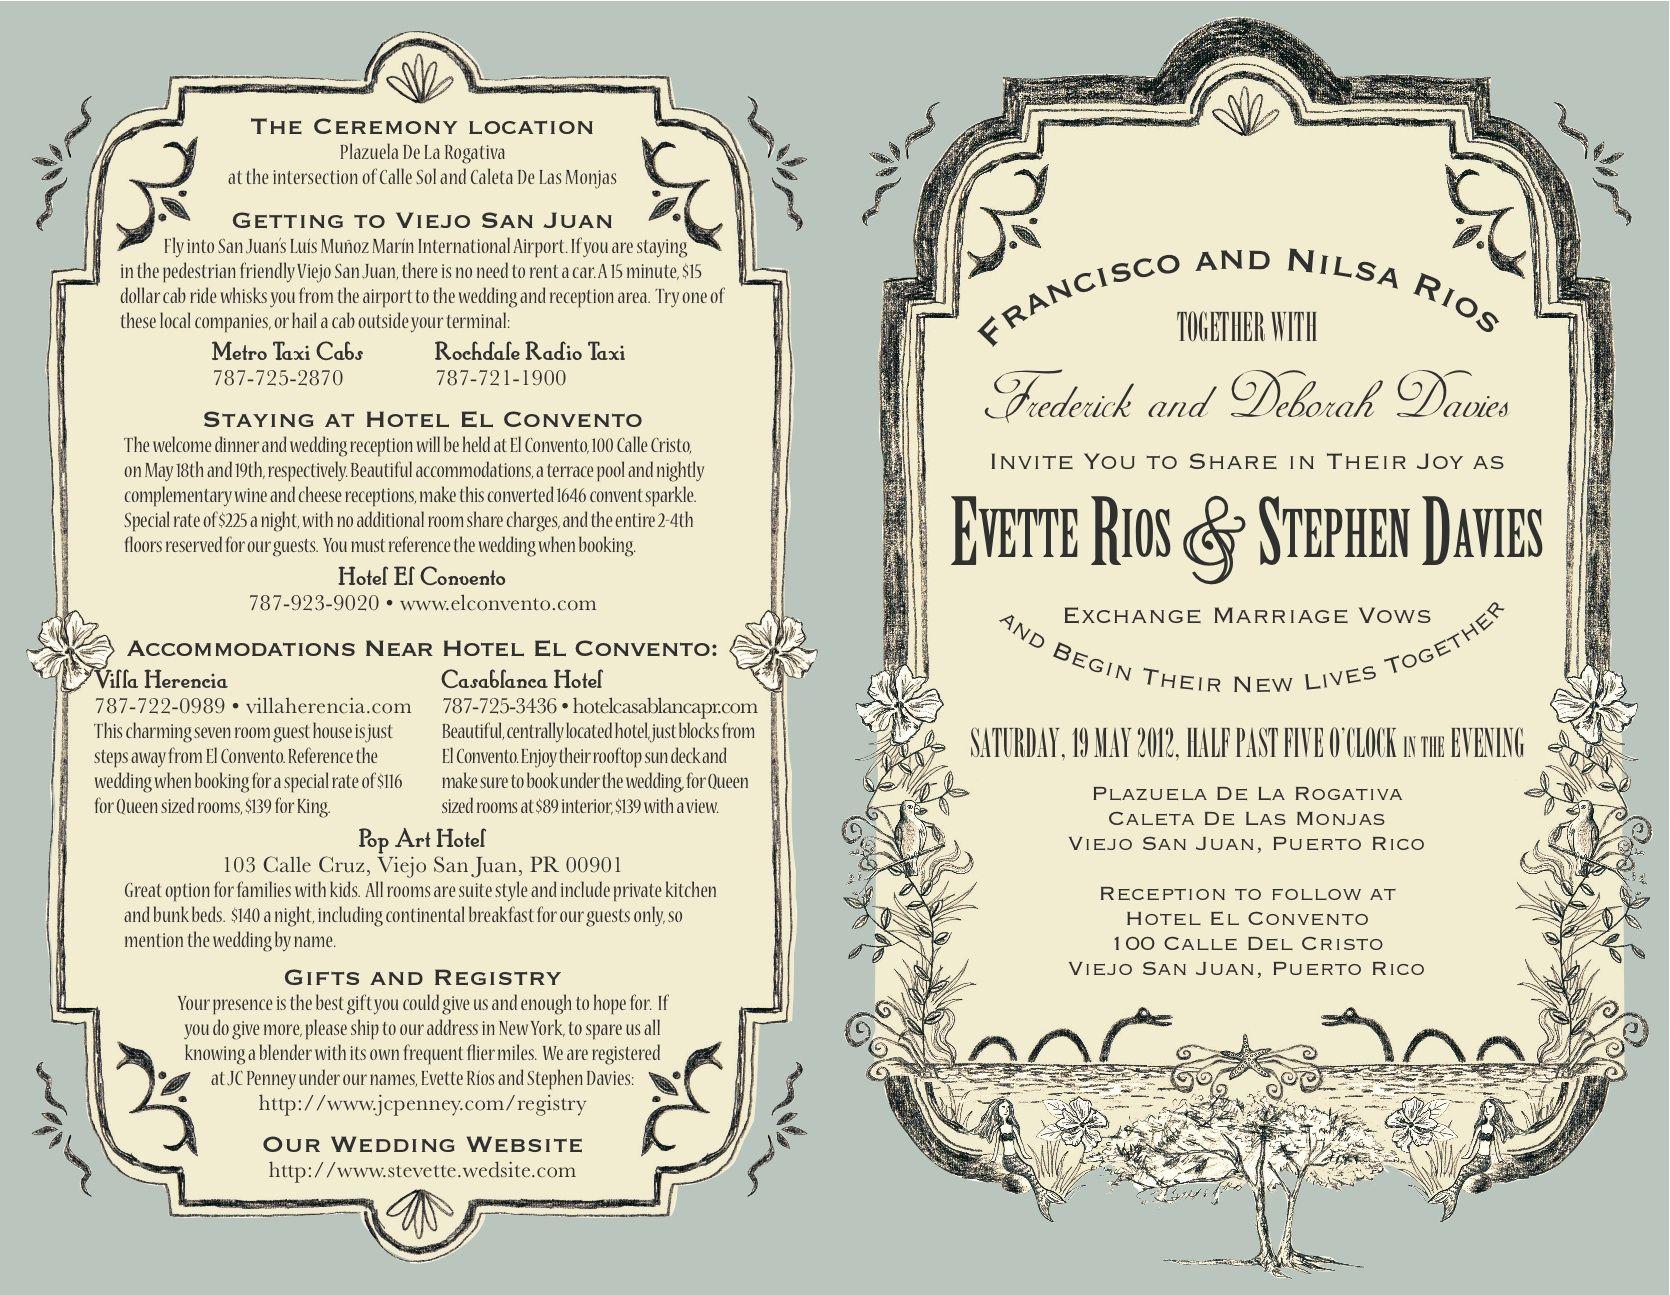 Baseball Wedding Invitation Templates Wedding Invitations Cheap - Wedding invitation templates: hotel accommodations template for wedding invitations